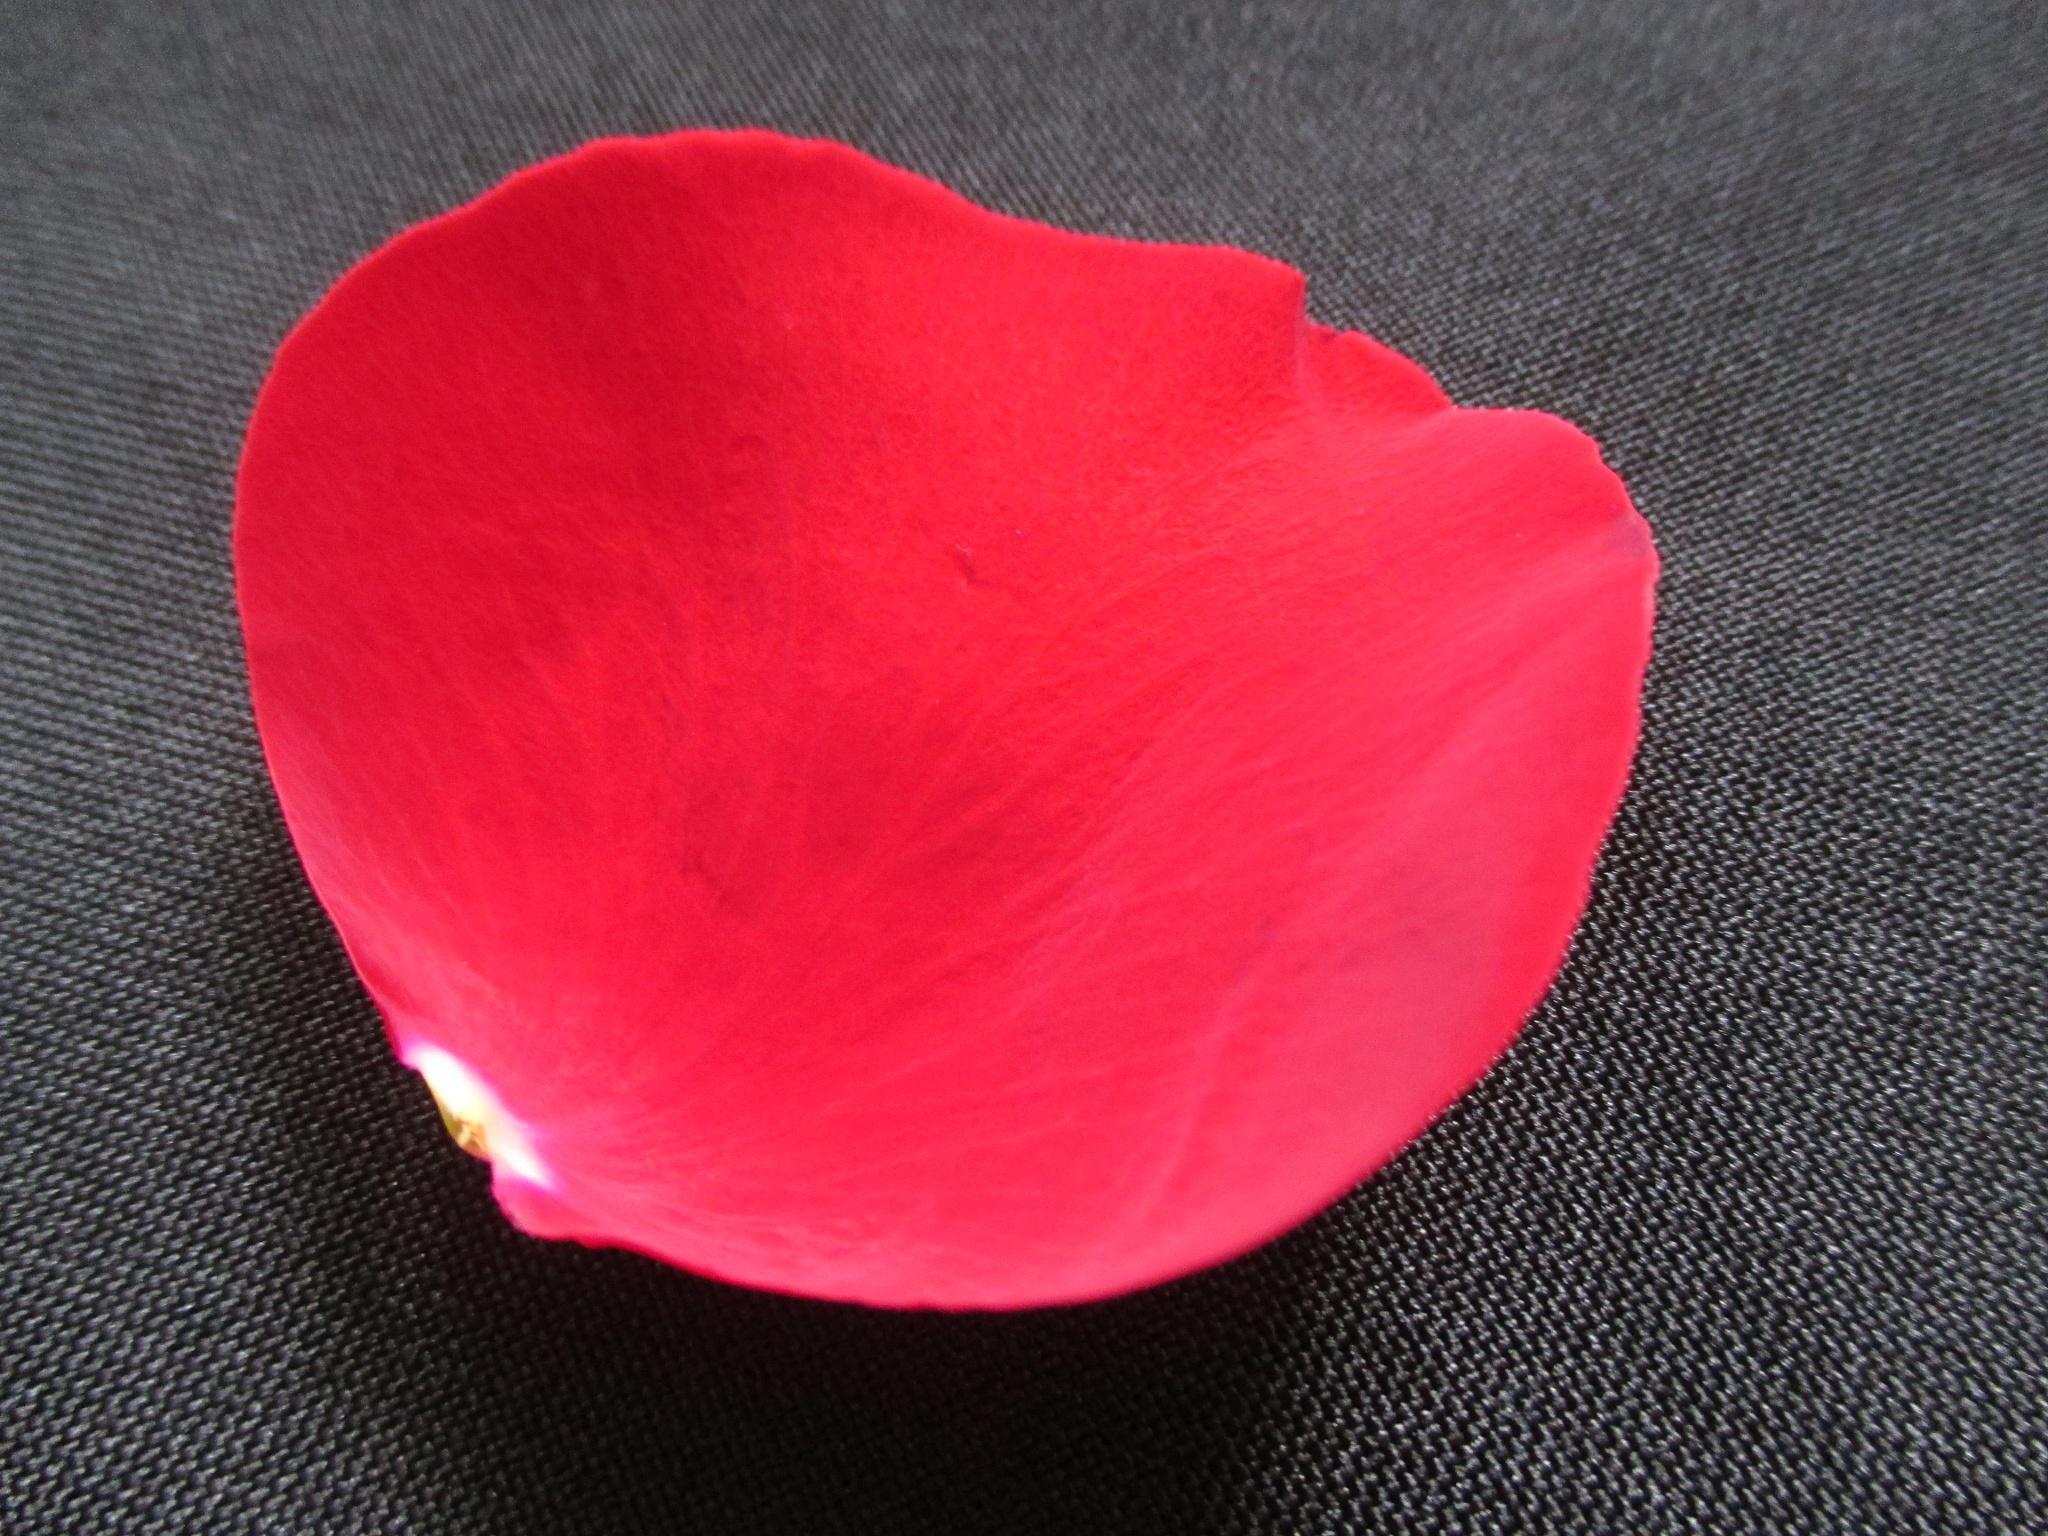 Rose petal by Lamar Smith